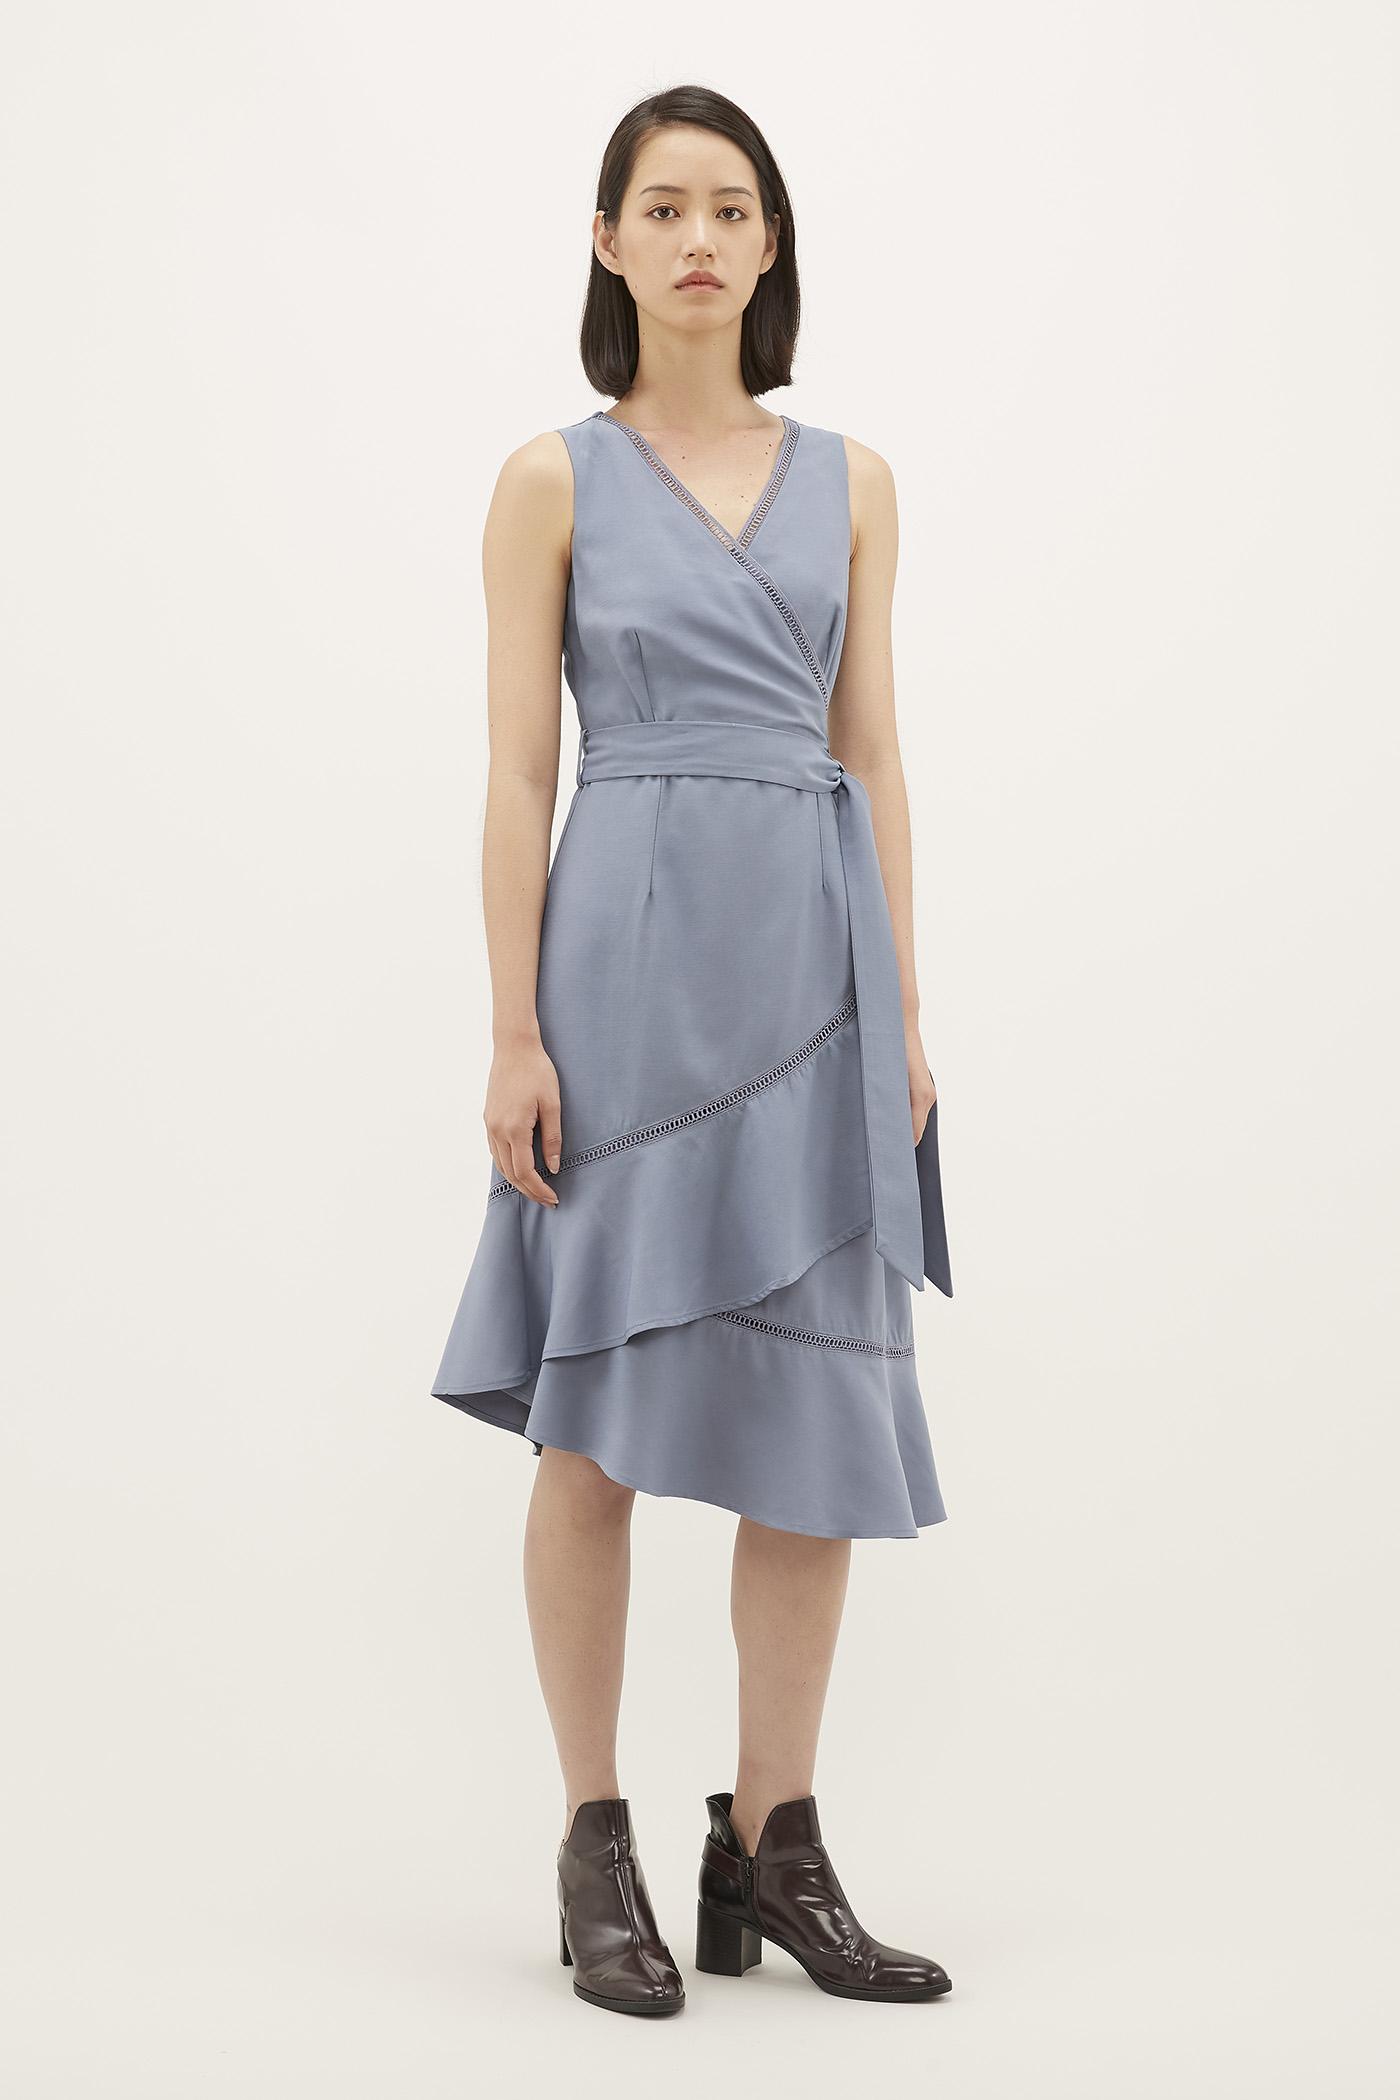 Delisa Layered Dress